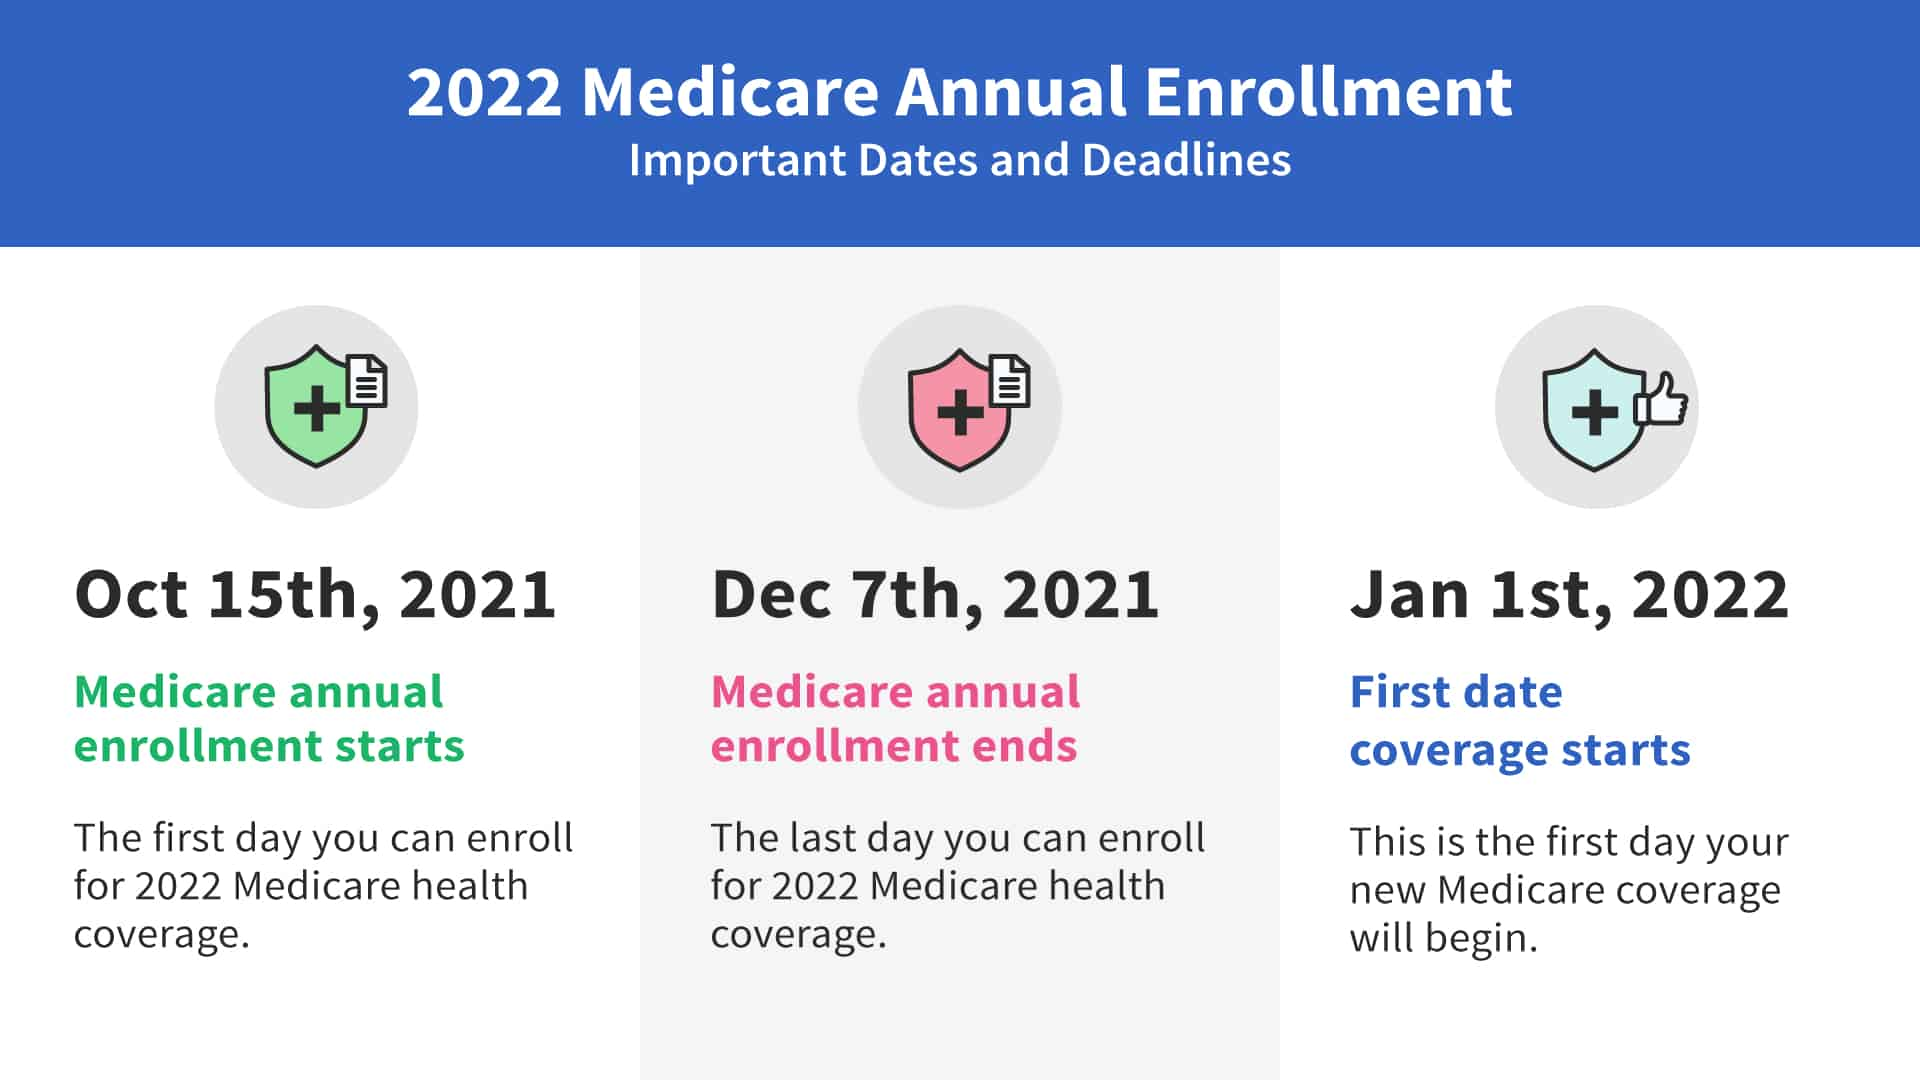 Medicare annual enrollment dates